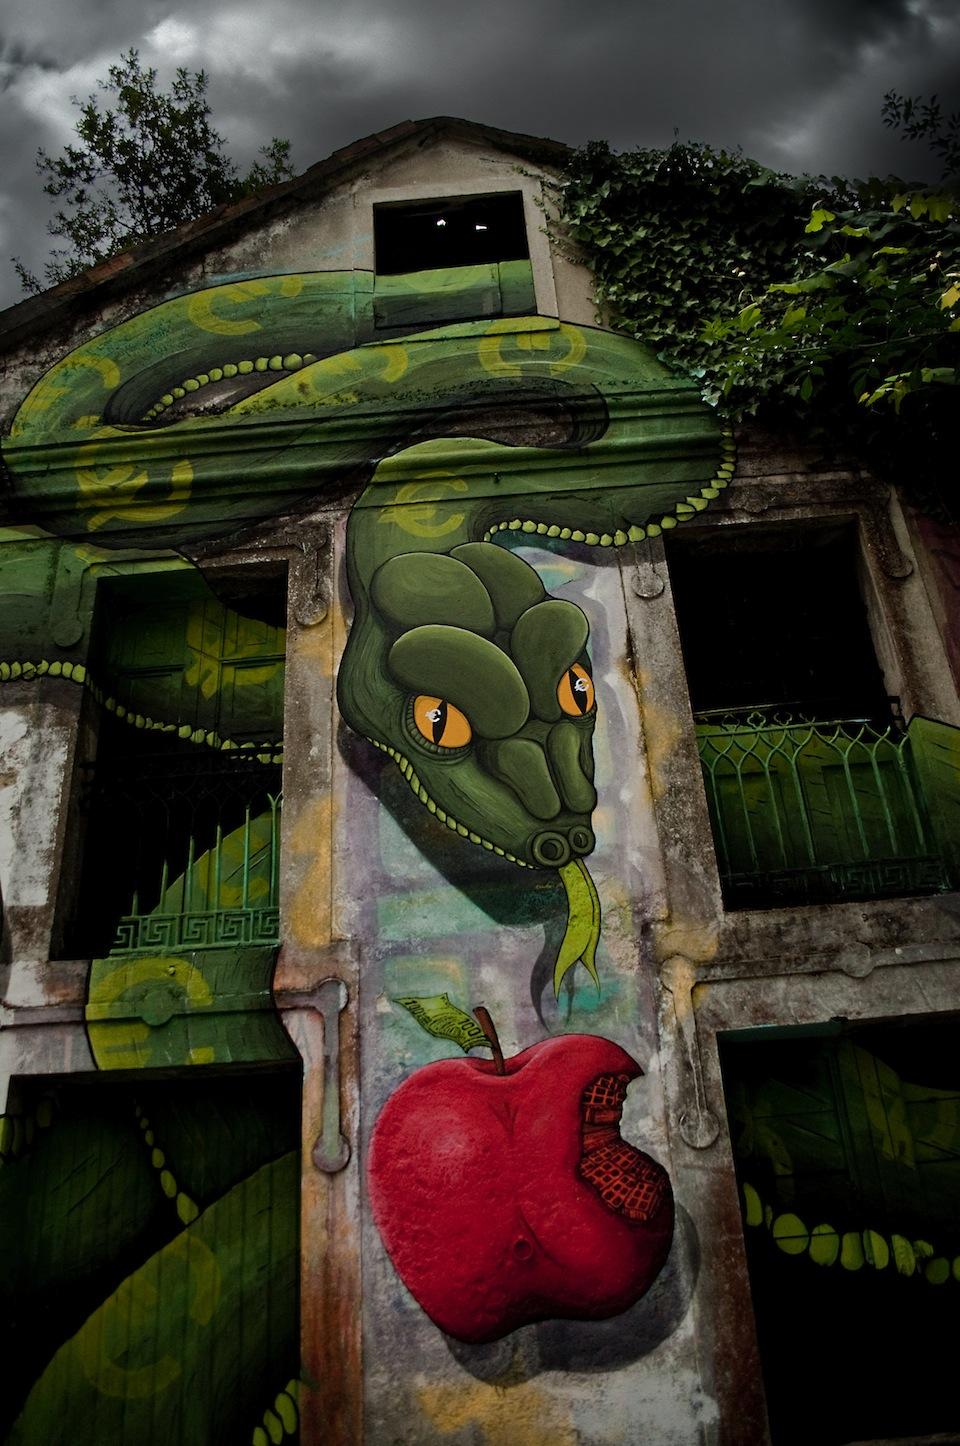 By-SOKRAM.-At-DESORDES-CREATIVAS-2012-in-Ordes-Galiza-Spain-3